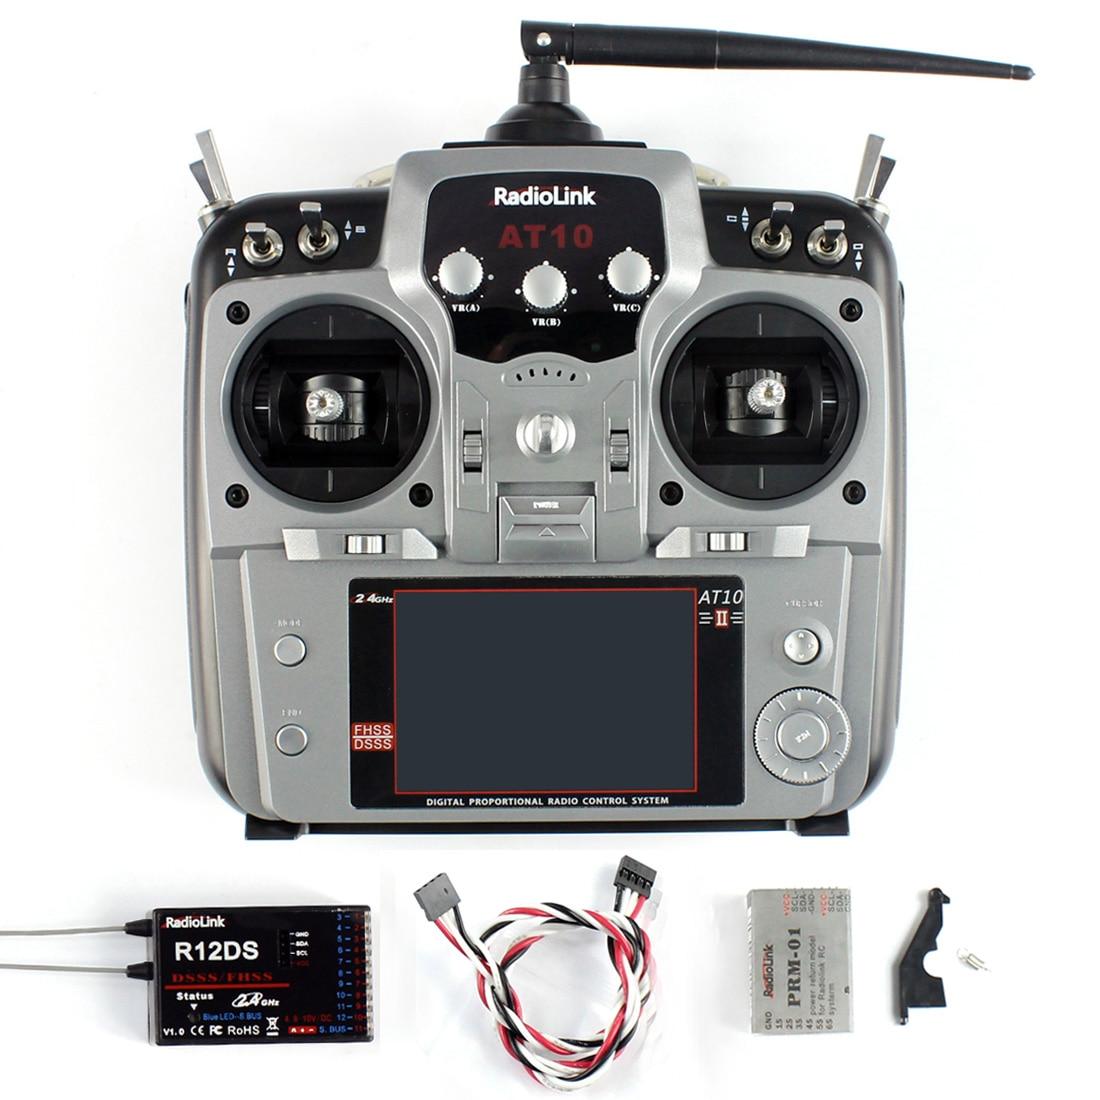 US $325 59 14% OFF|DIY RC Drone HMF U580 Quadcopter GPS Foldable Landing  APM2 8 PX4 Flight Control 700KV Motor ESC Radiolink AT10 II TX&RX F11066  G-in